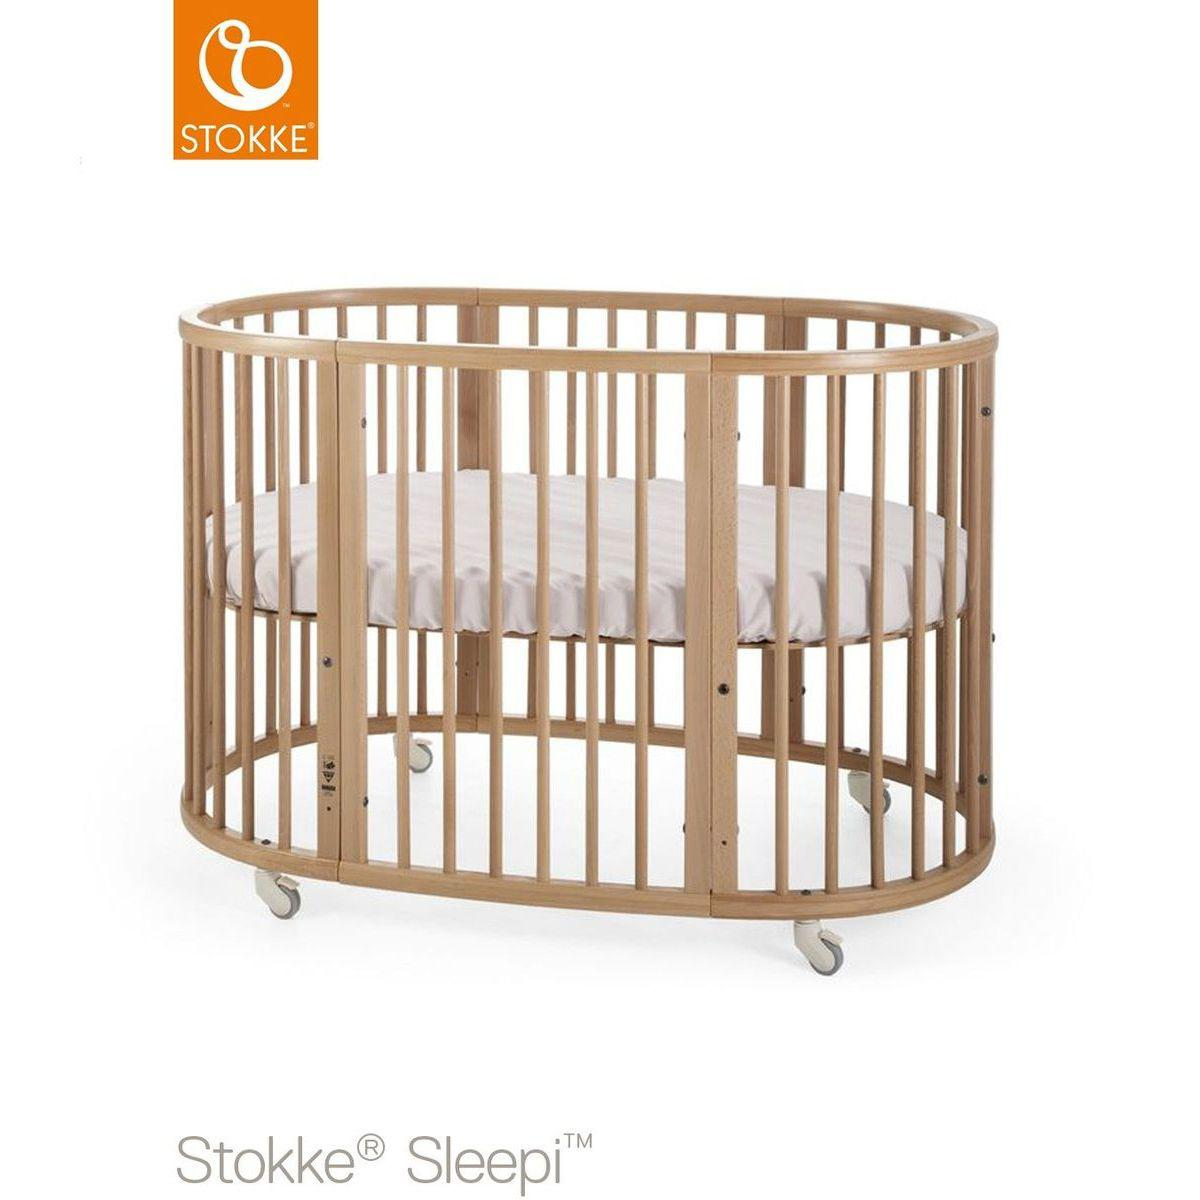 Babybett mitwachsend 120cm SLEEPI Stokke natural